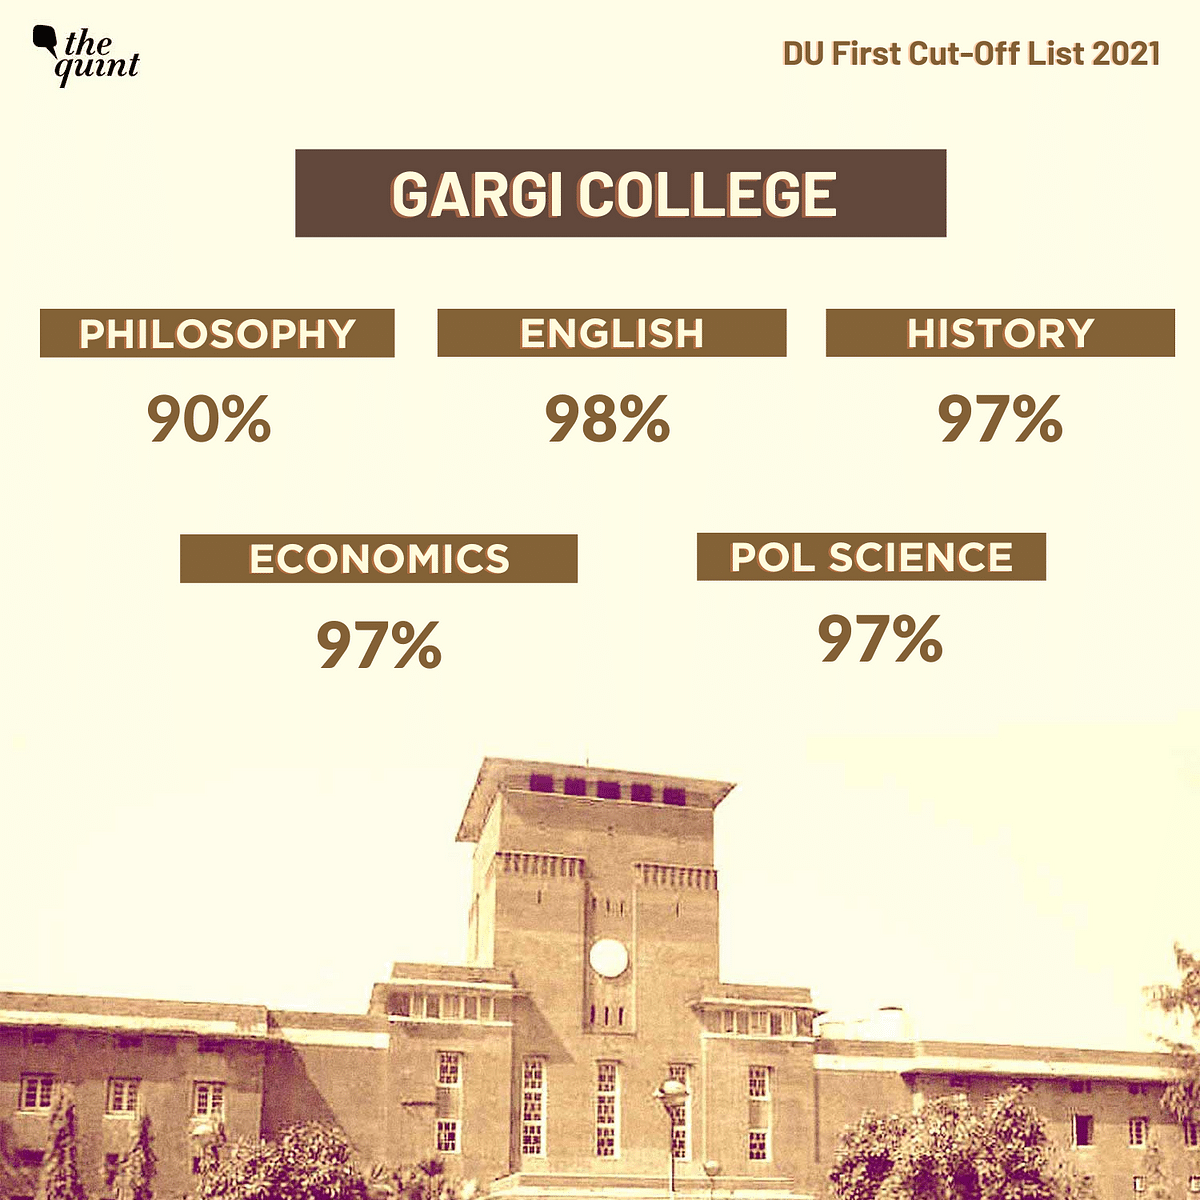 "<div class=""paragraphs""><p>First cut-off list: Gargi College</p></div>"